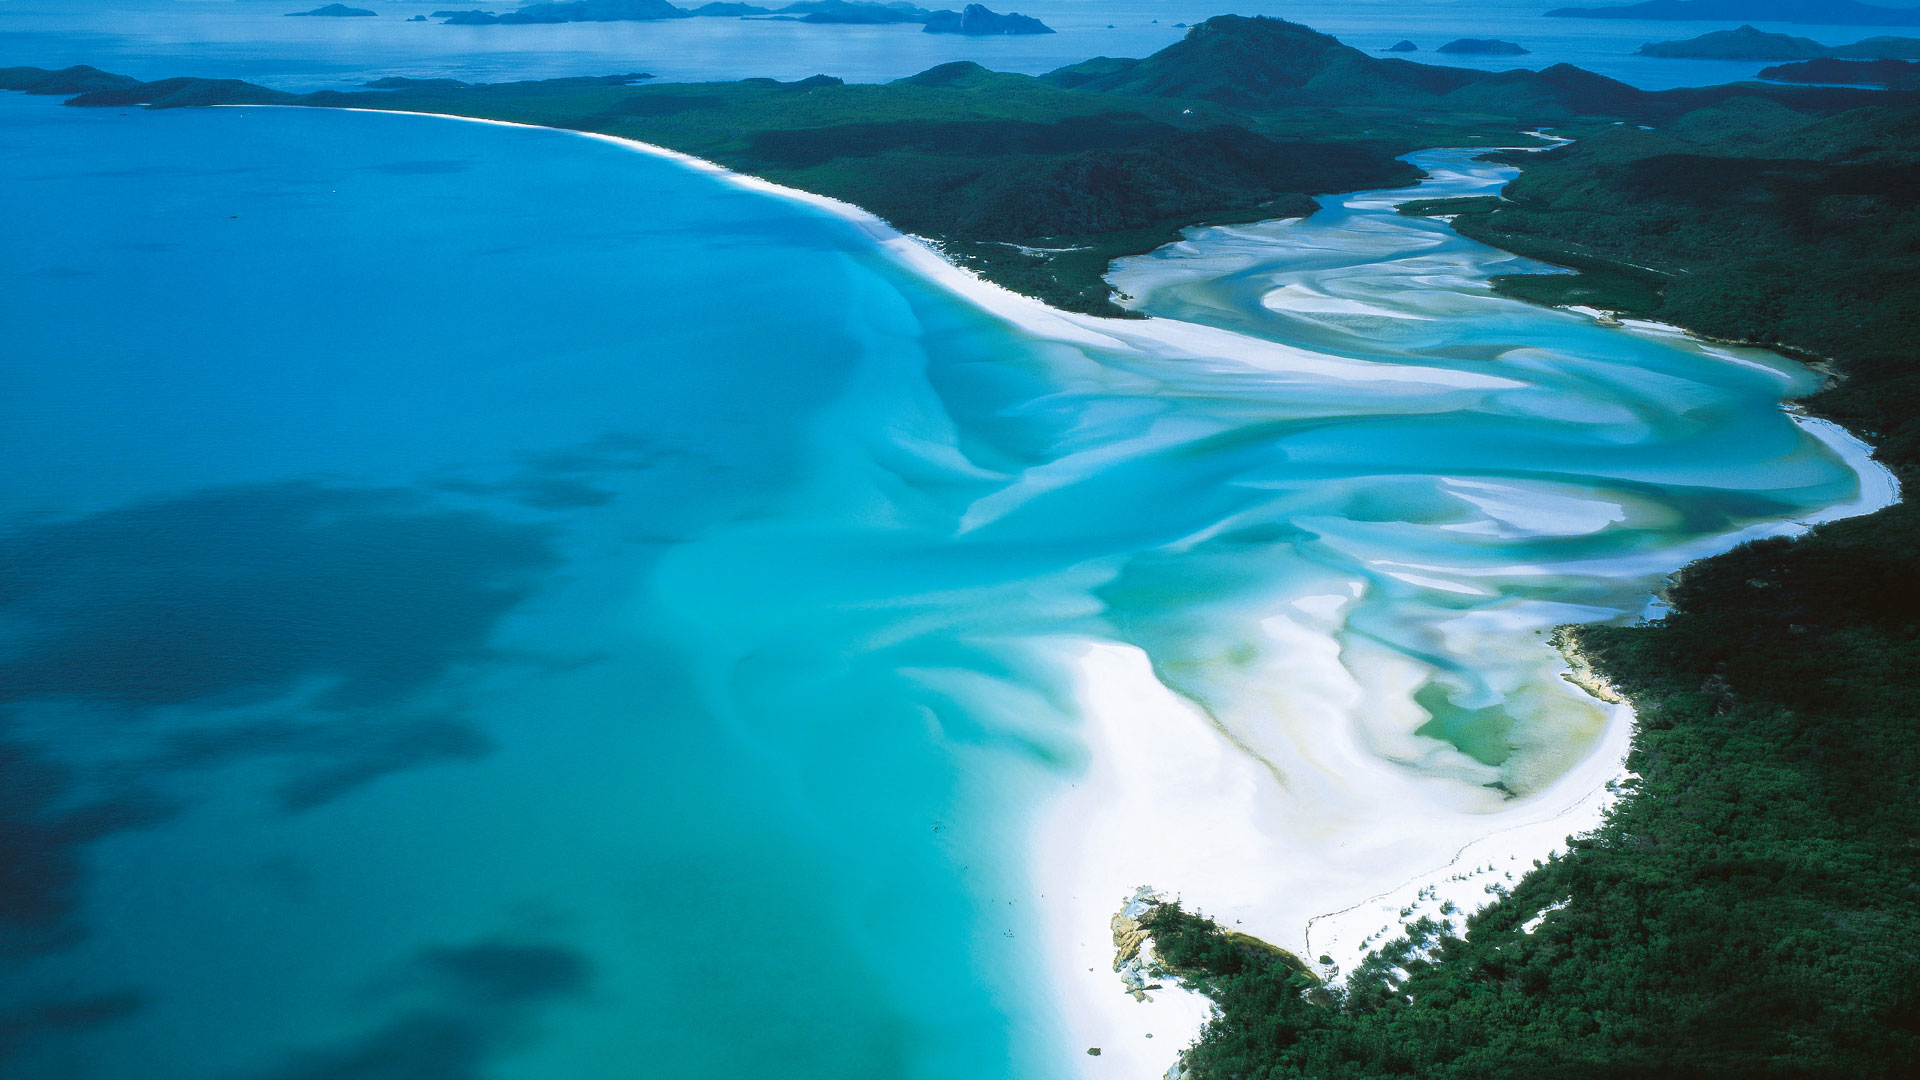 http://hdwallsize.com/wallpaperhd/landscape-beach-sdyney-australia-wallpaper.html